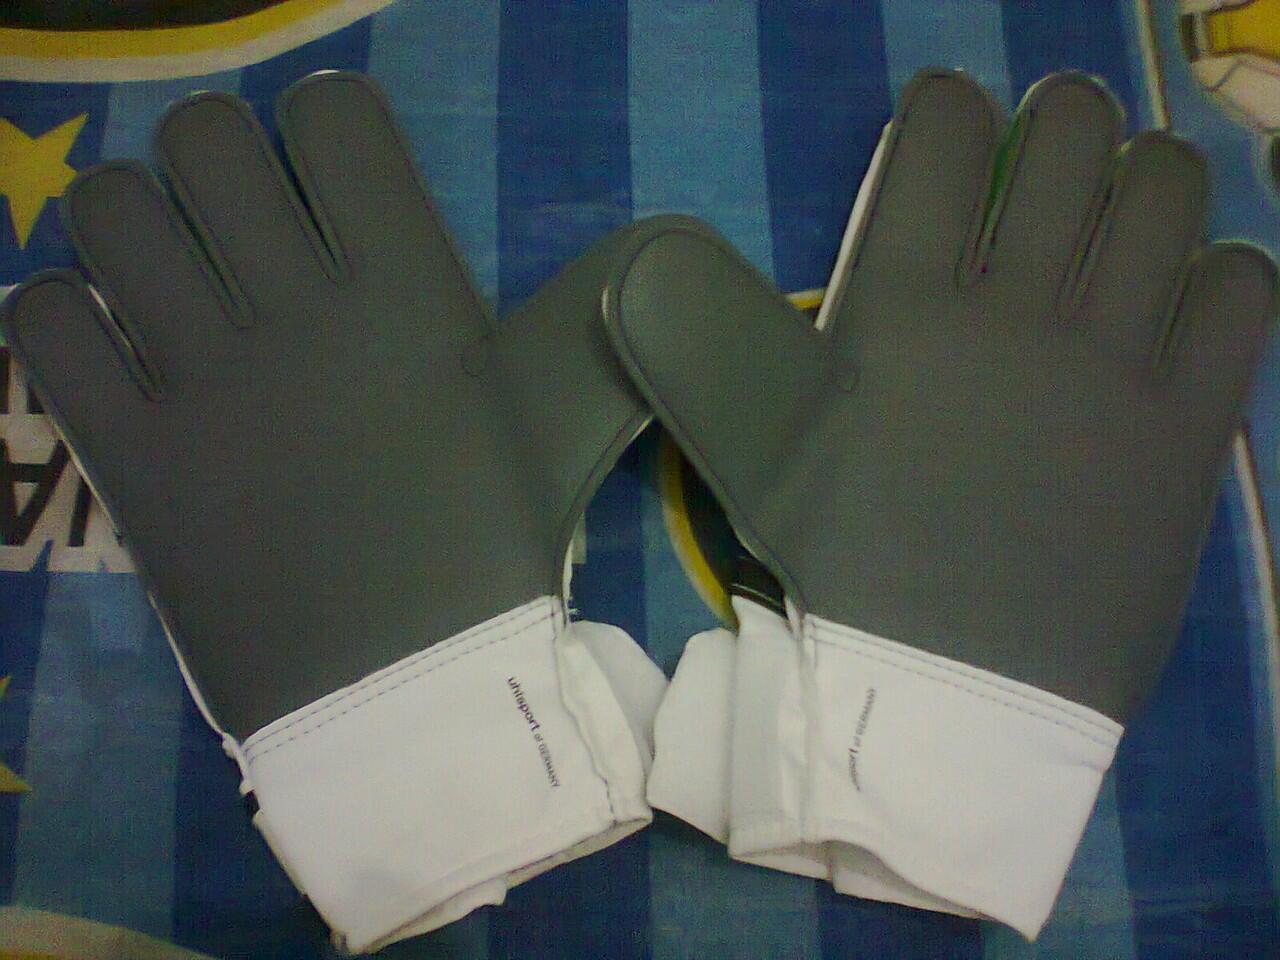 Lelang Sarung Tangan Kiper Original Uhlsport (BNIB/New)